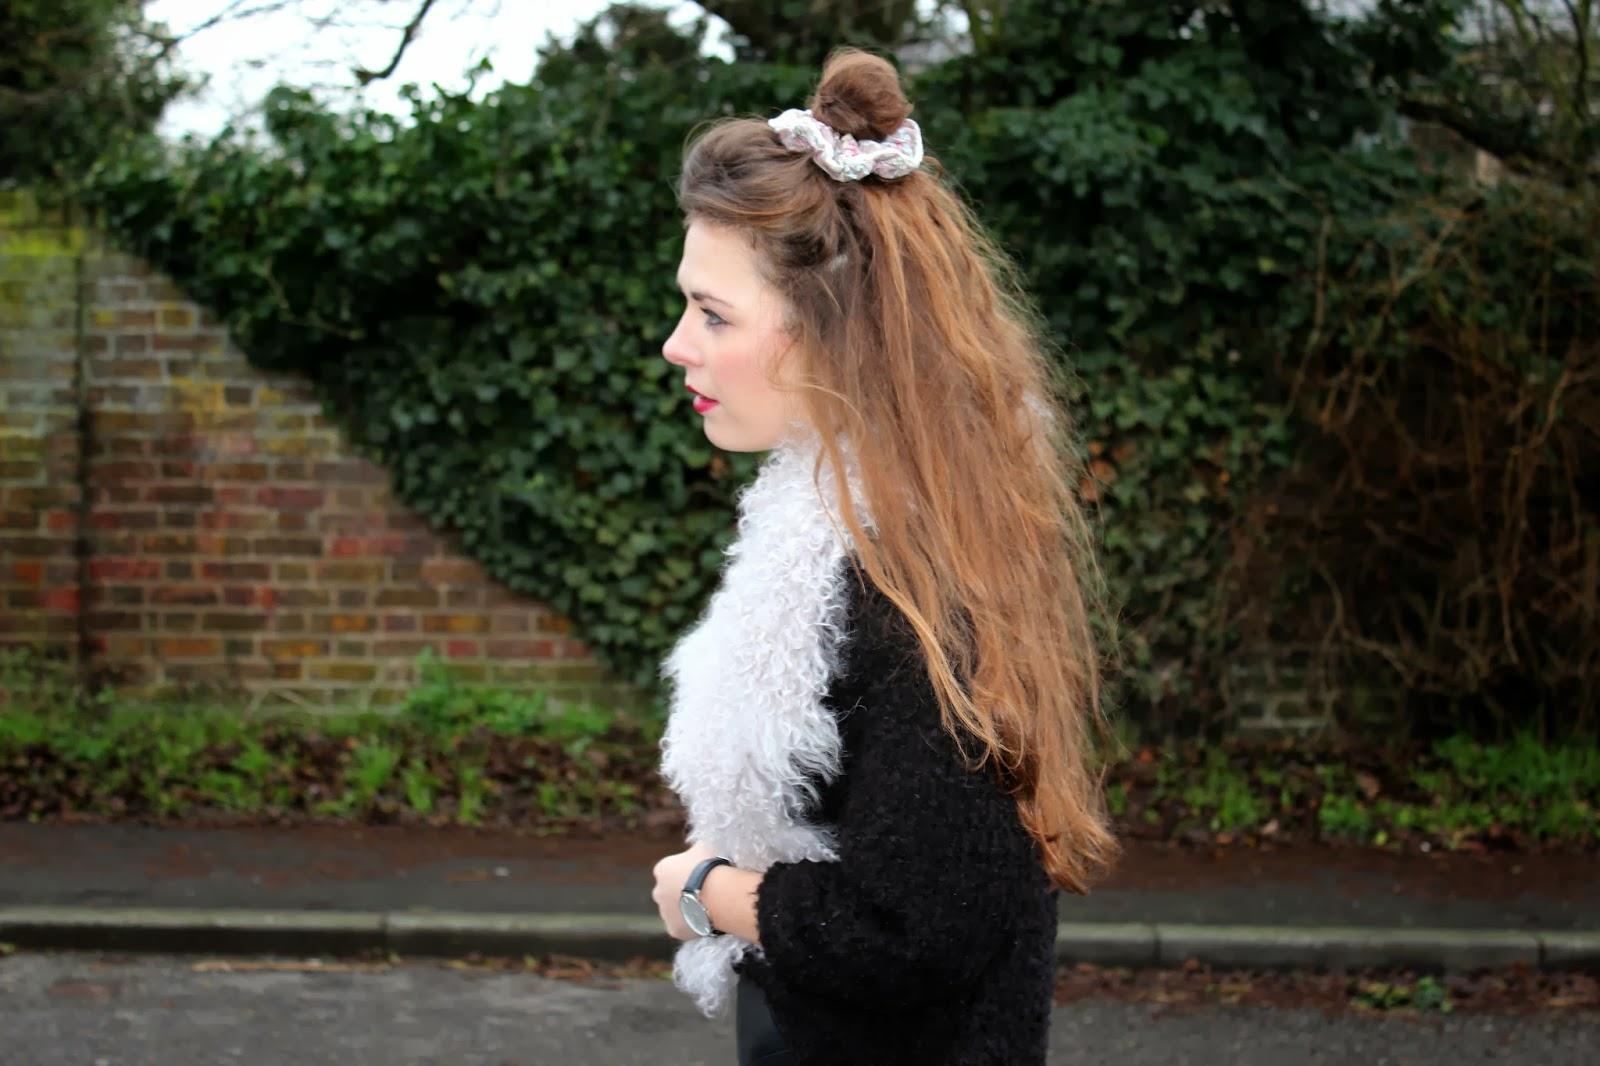 Messy_bun_hair_Style